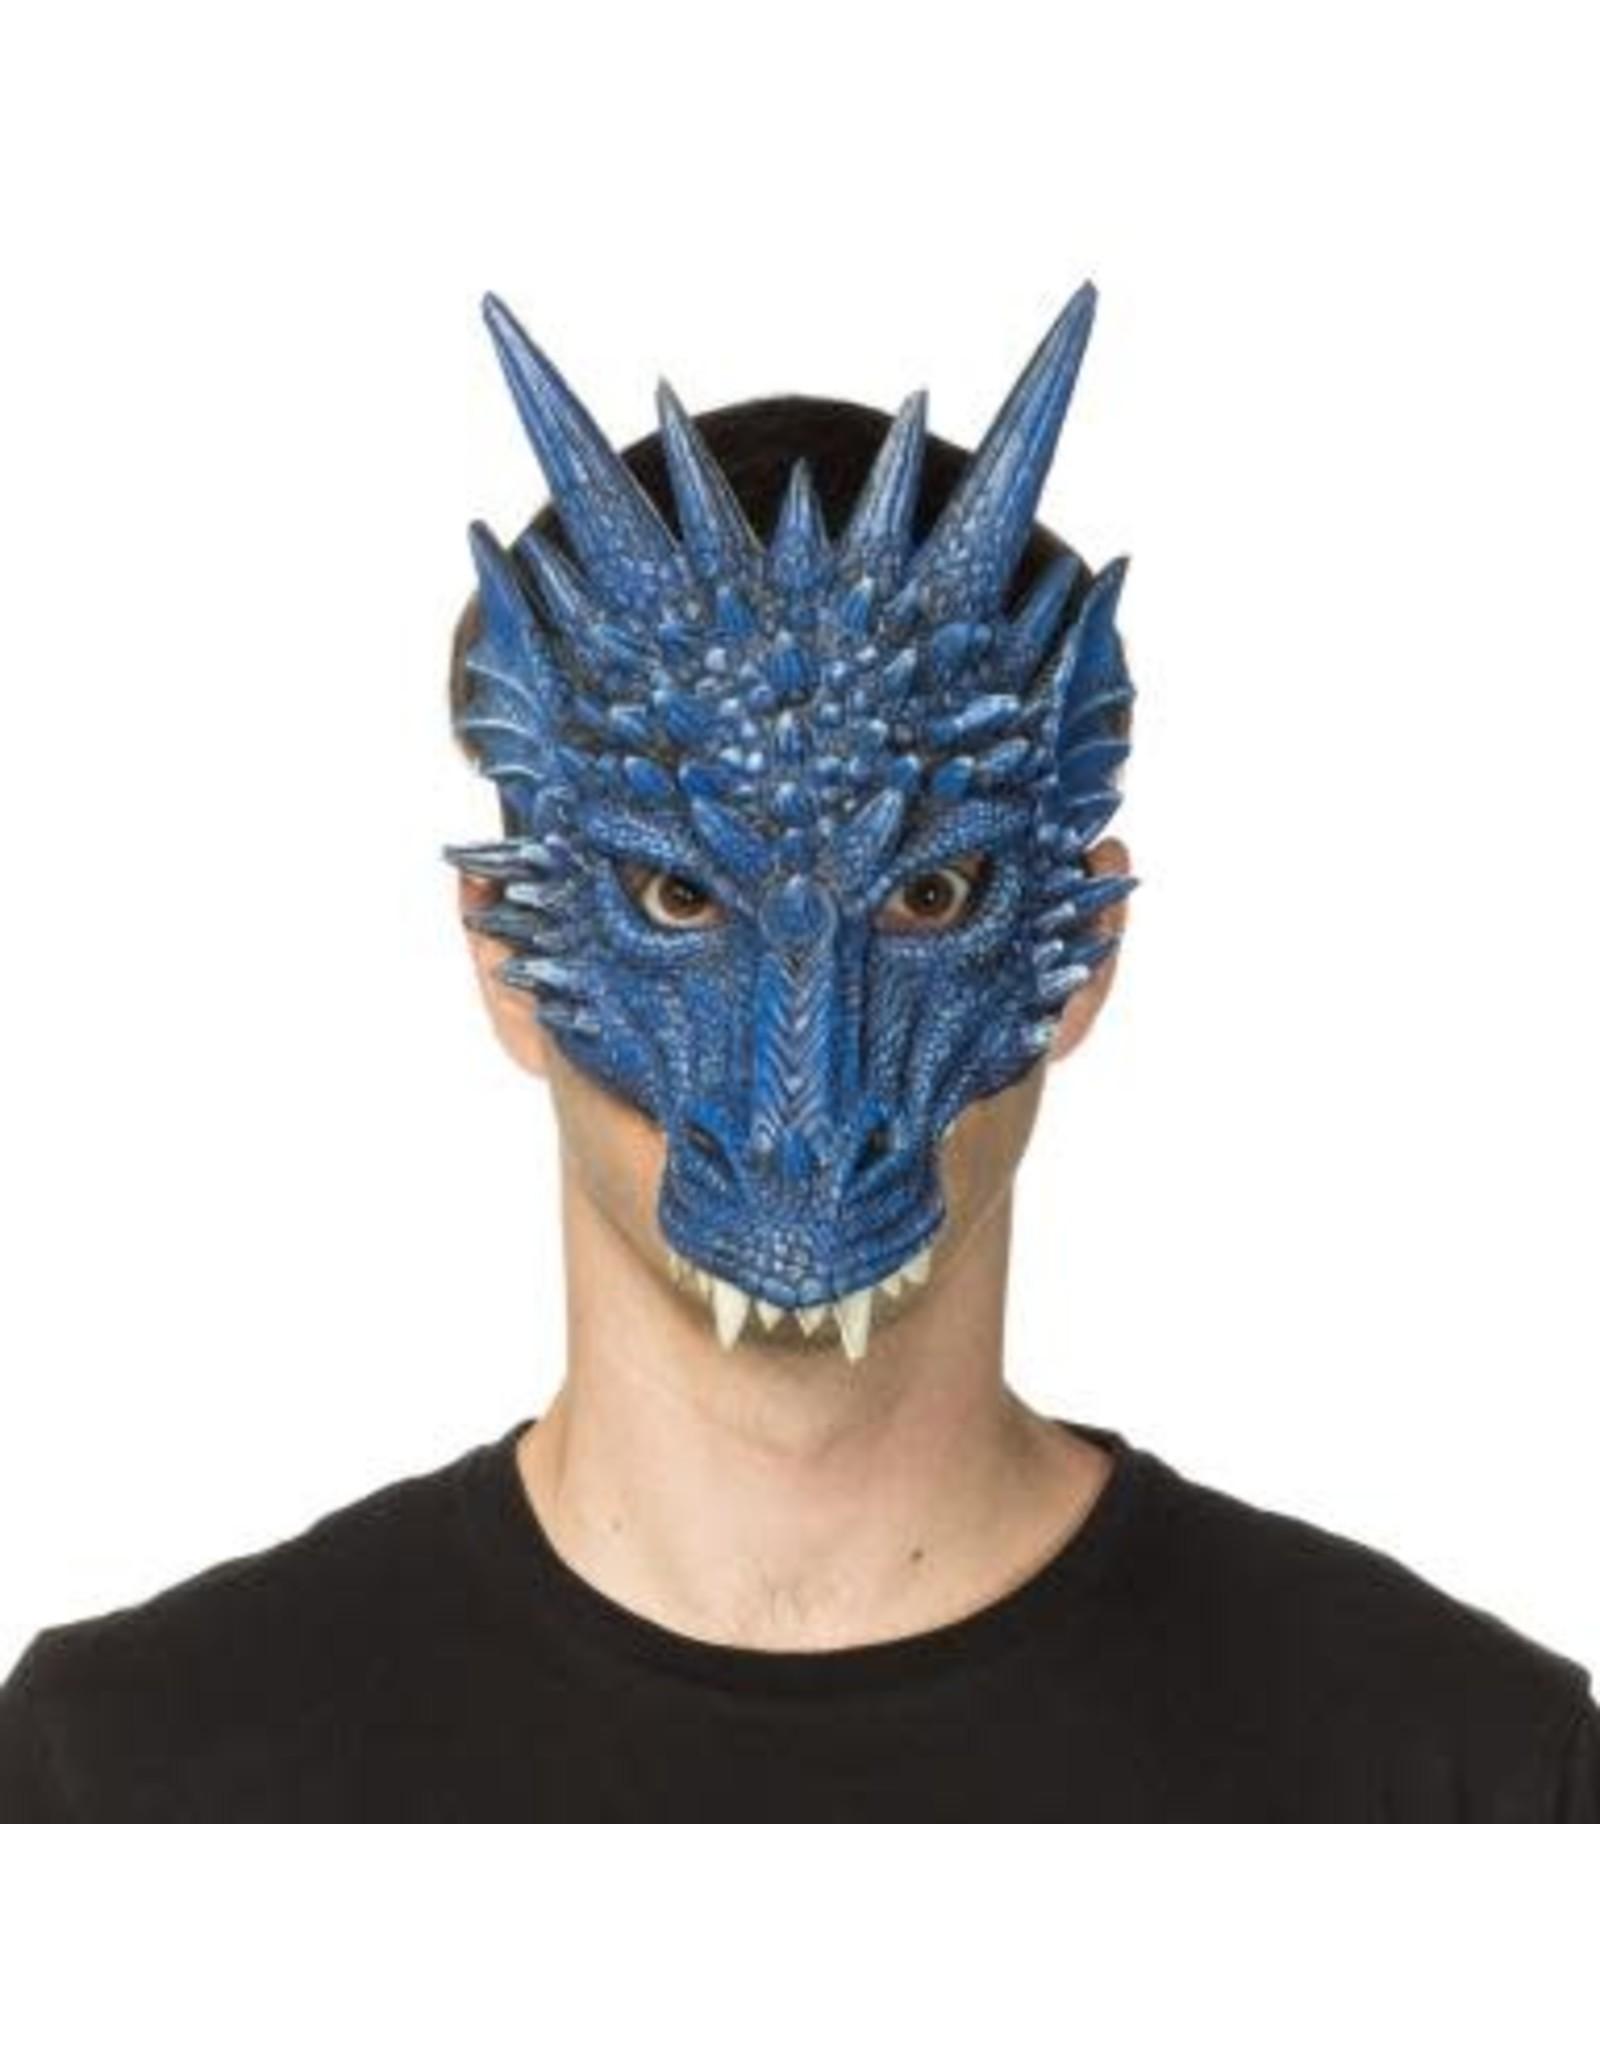 HM Smallwares Fantasy Dragon Mask